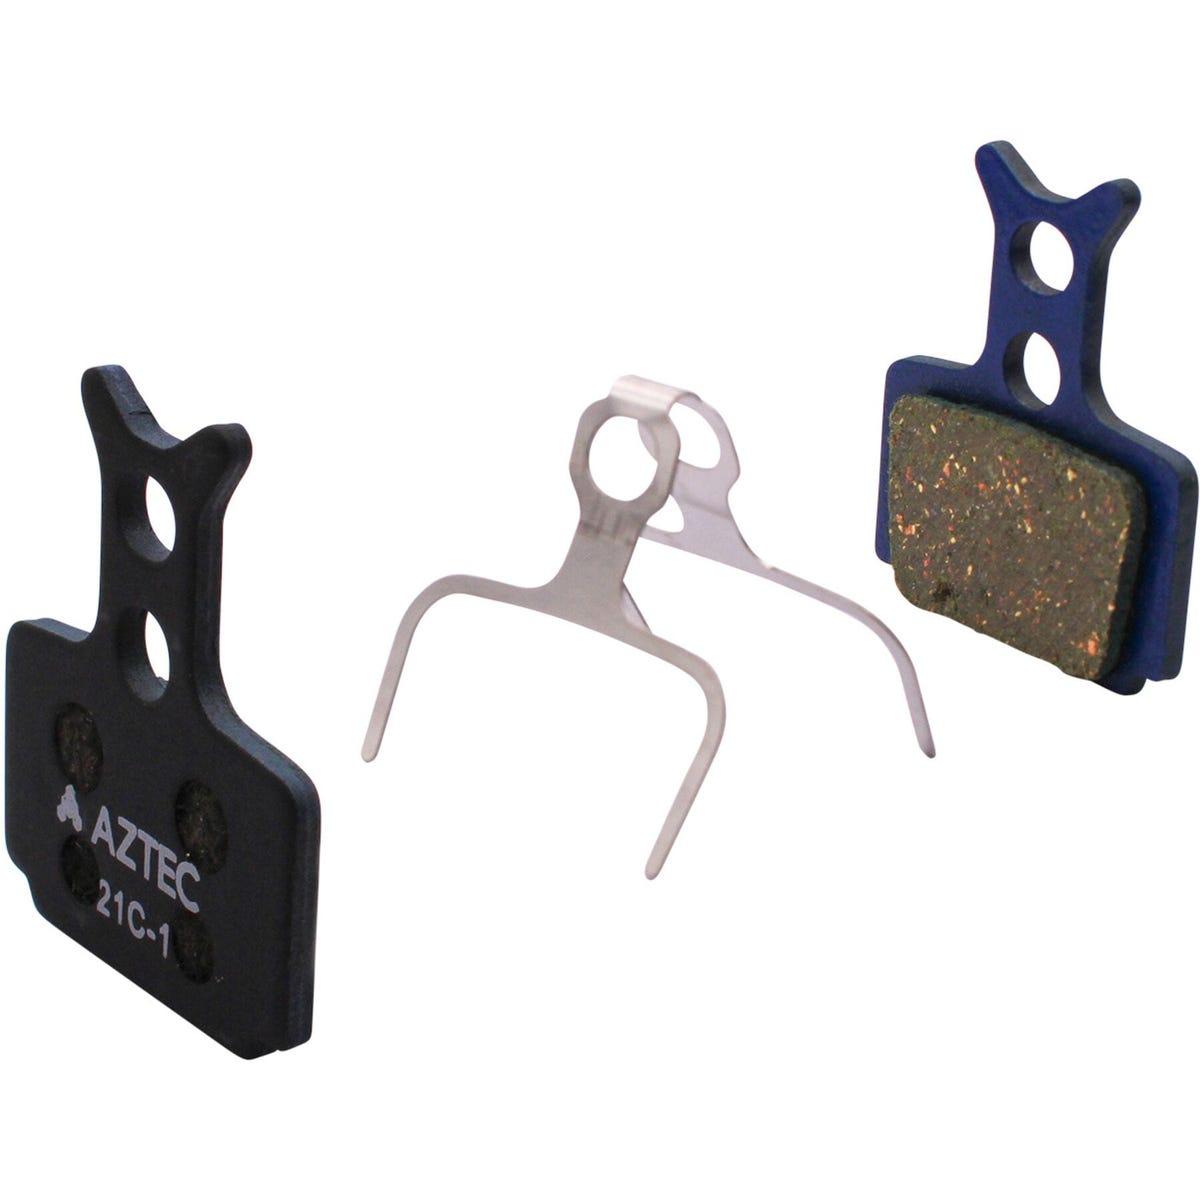 Aztec Organic disc brake pads for Formula Oro Mega